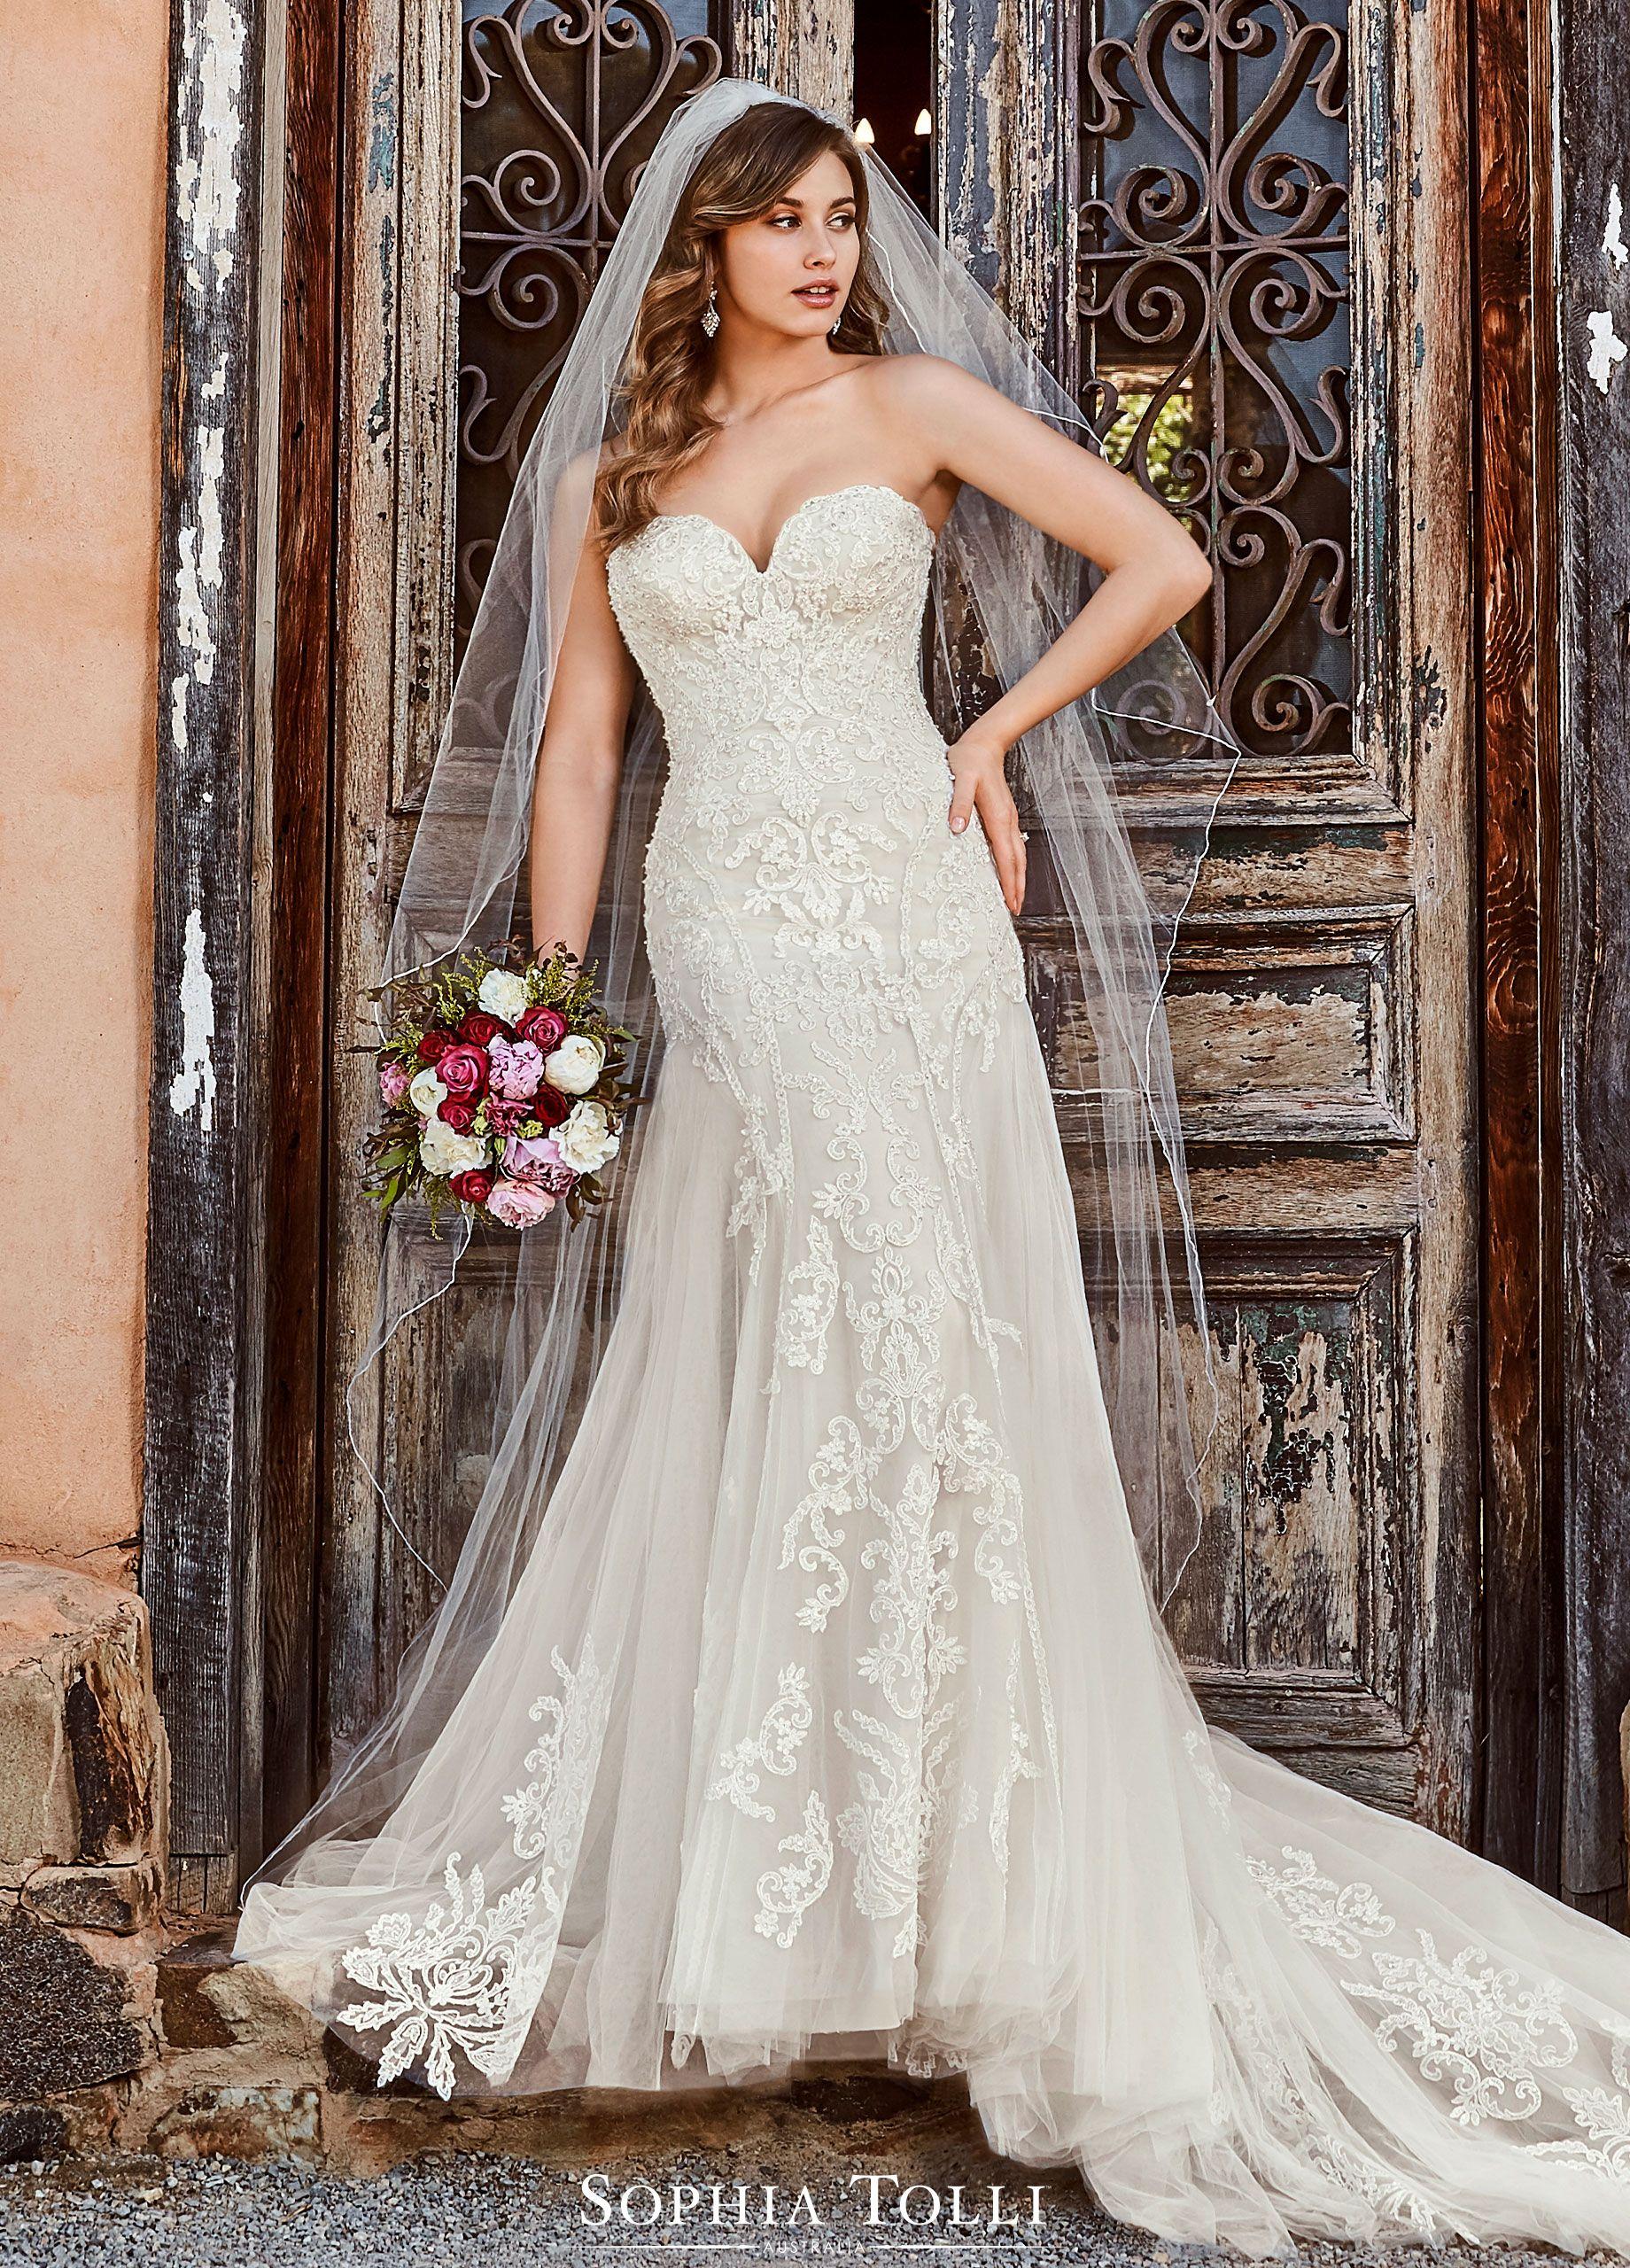 Sophia Tolli Reanna Bridal Dresses Wedding Dresses Romantic Designer Wedding Dresses